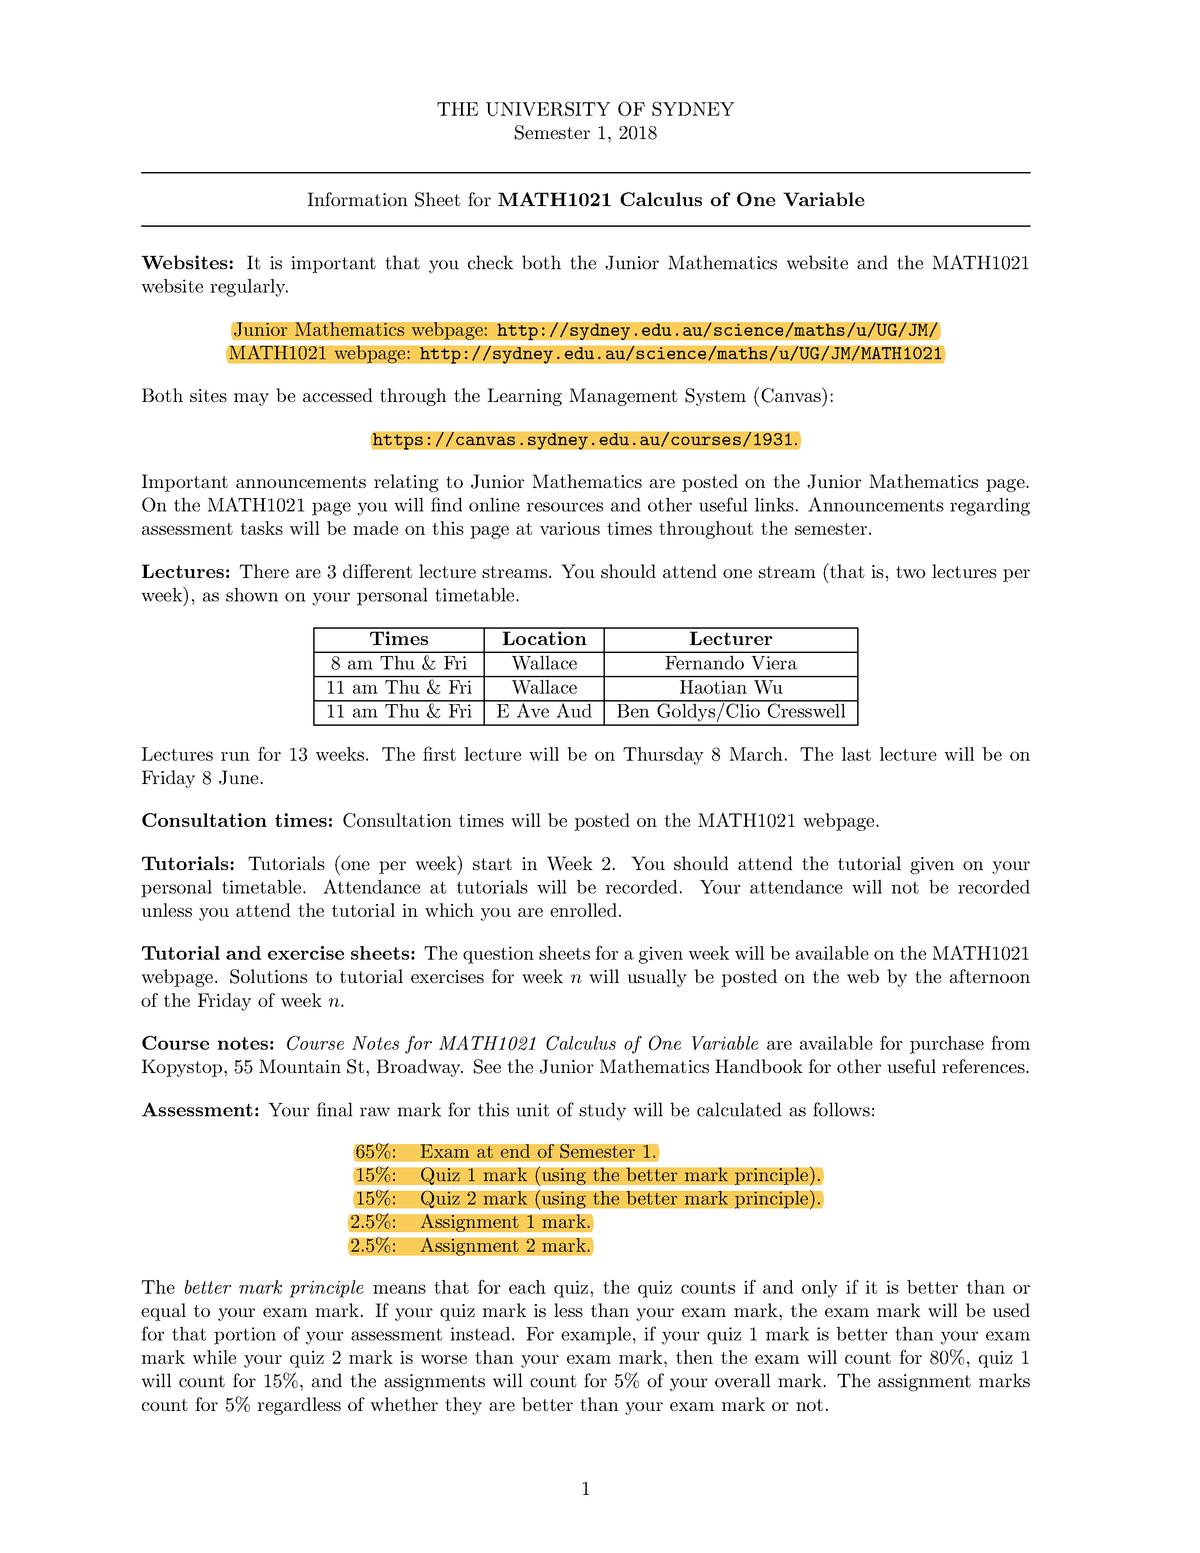 MATH1021 unit outline - Summary MATH1005 - StuDocu